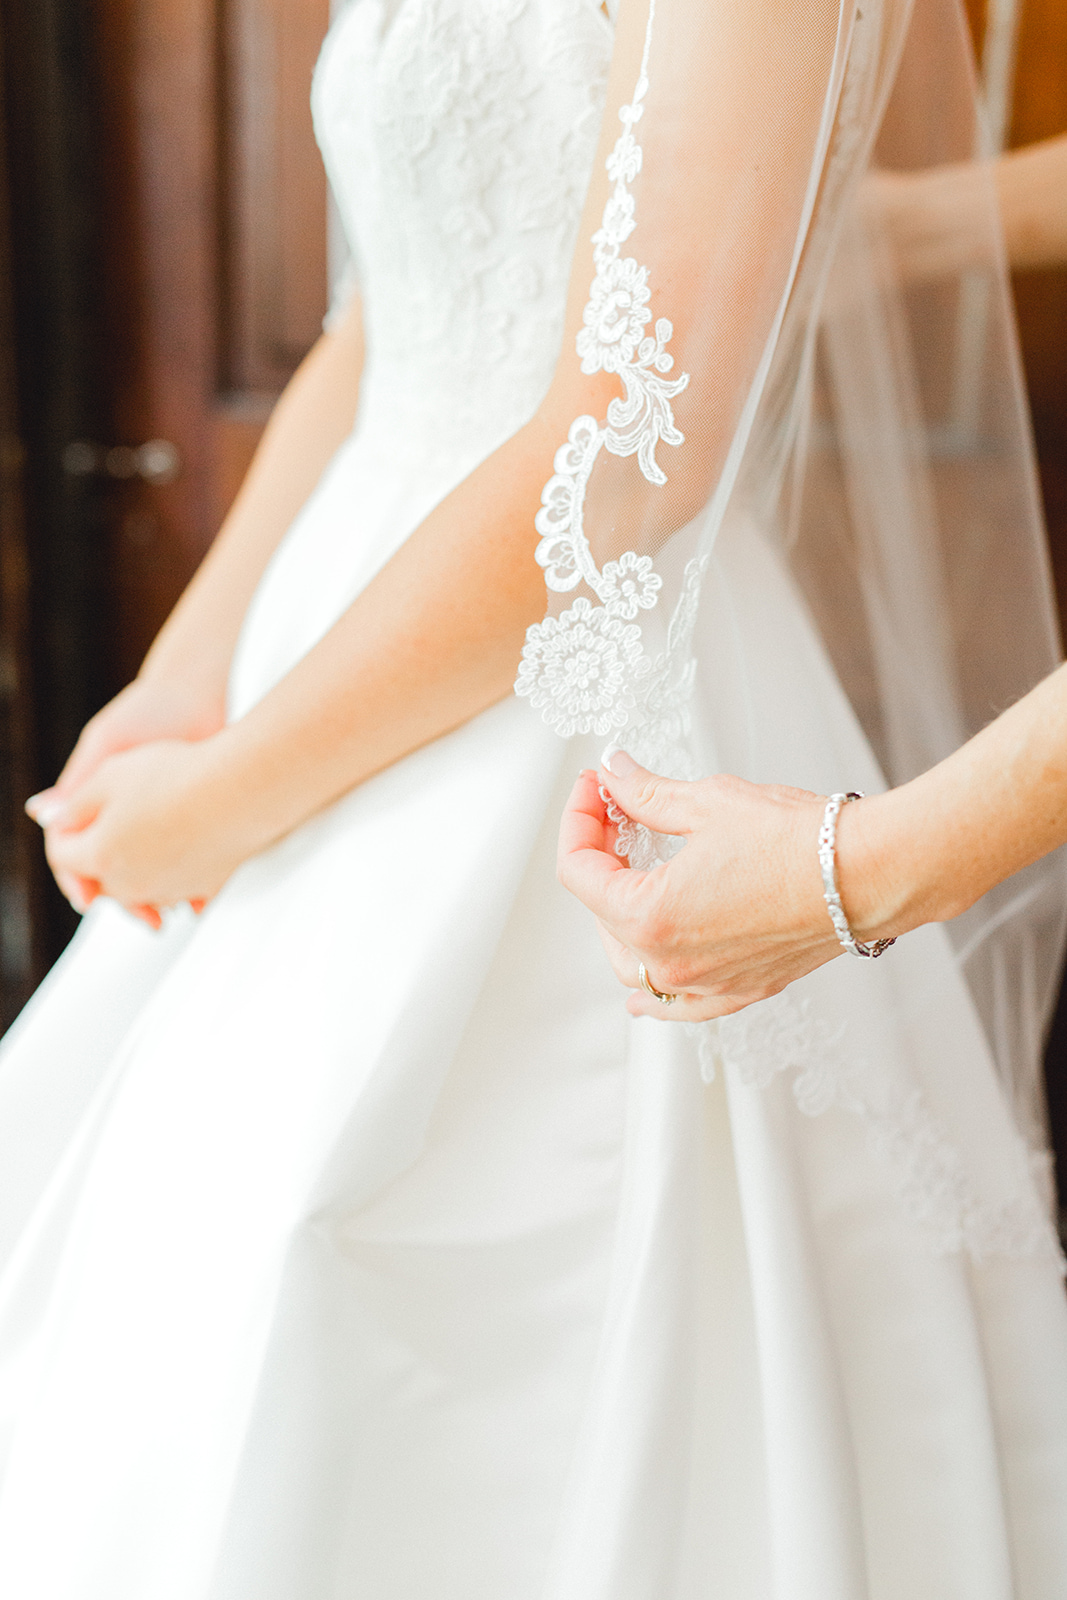 Ushers_Ferry_Cedar_Rapids_Wedding_Ella+Phil-0214.jpg